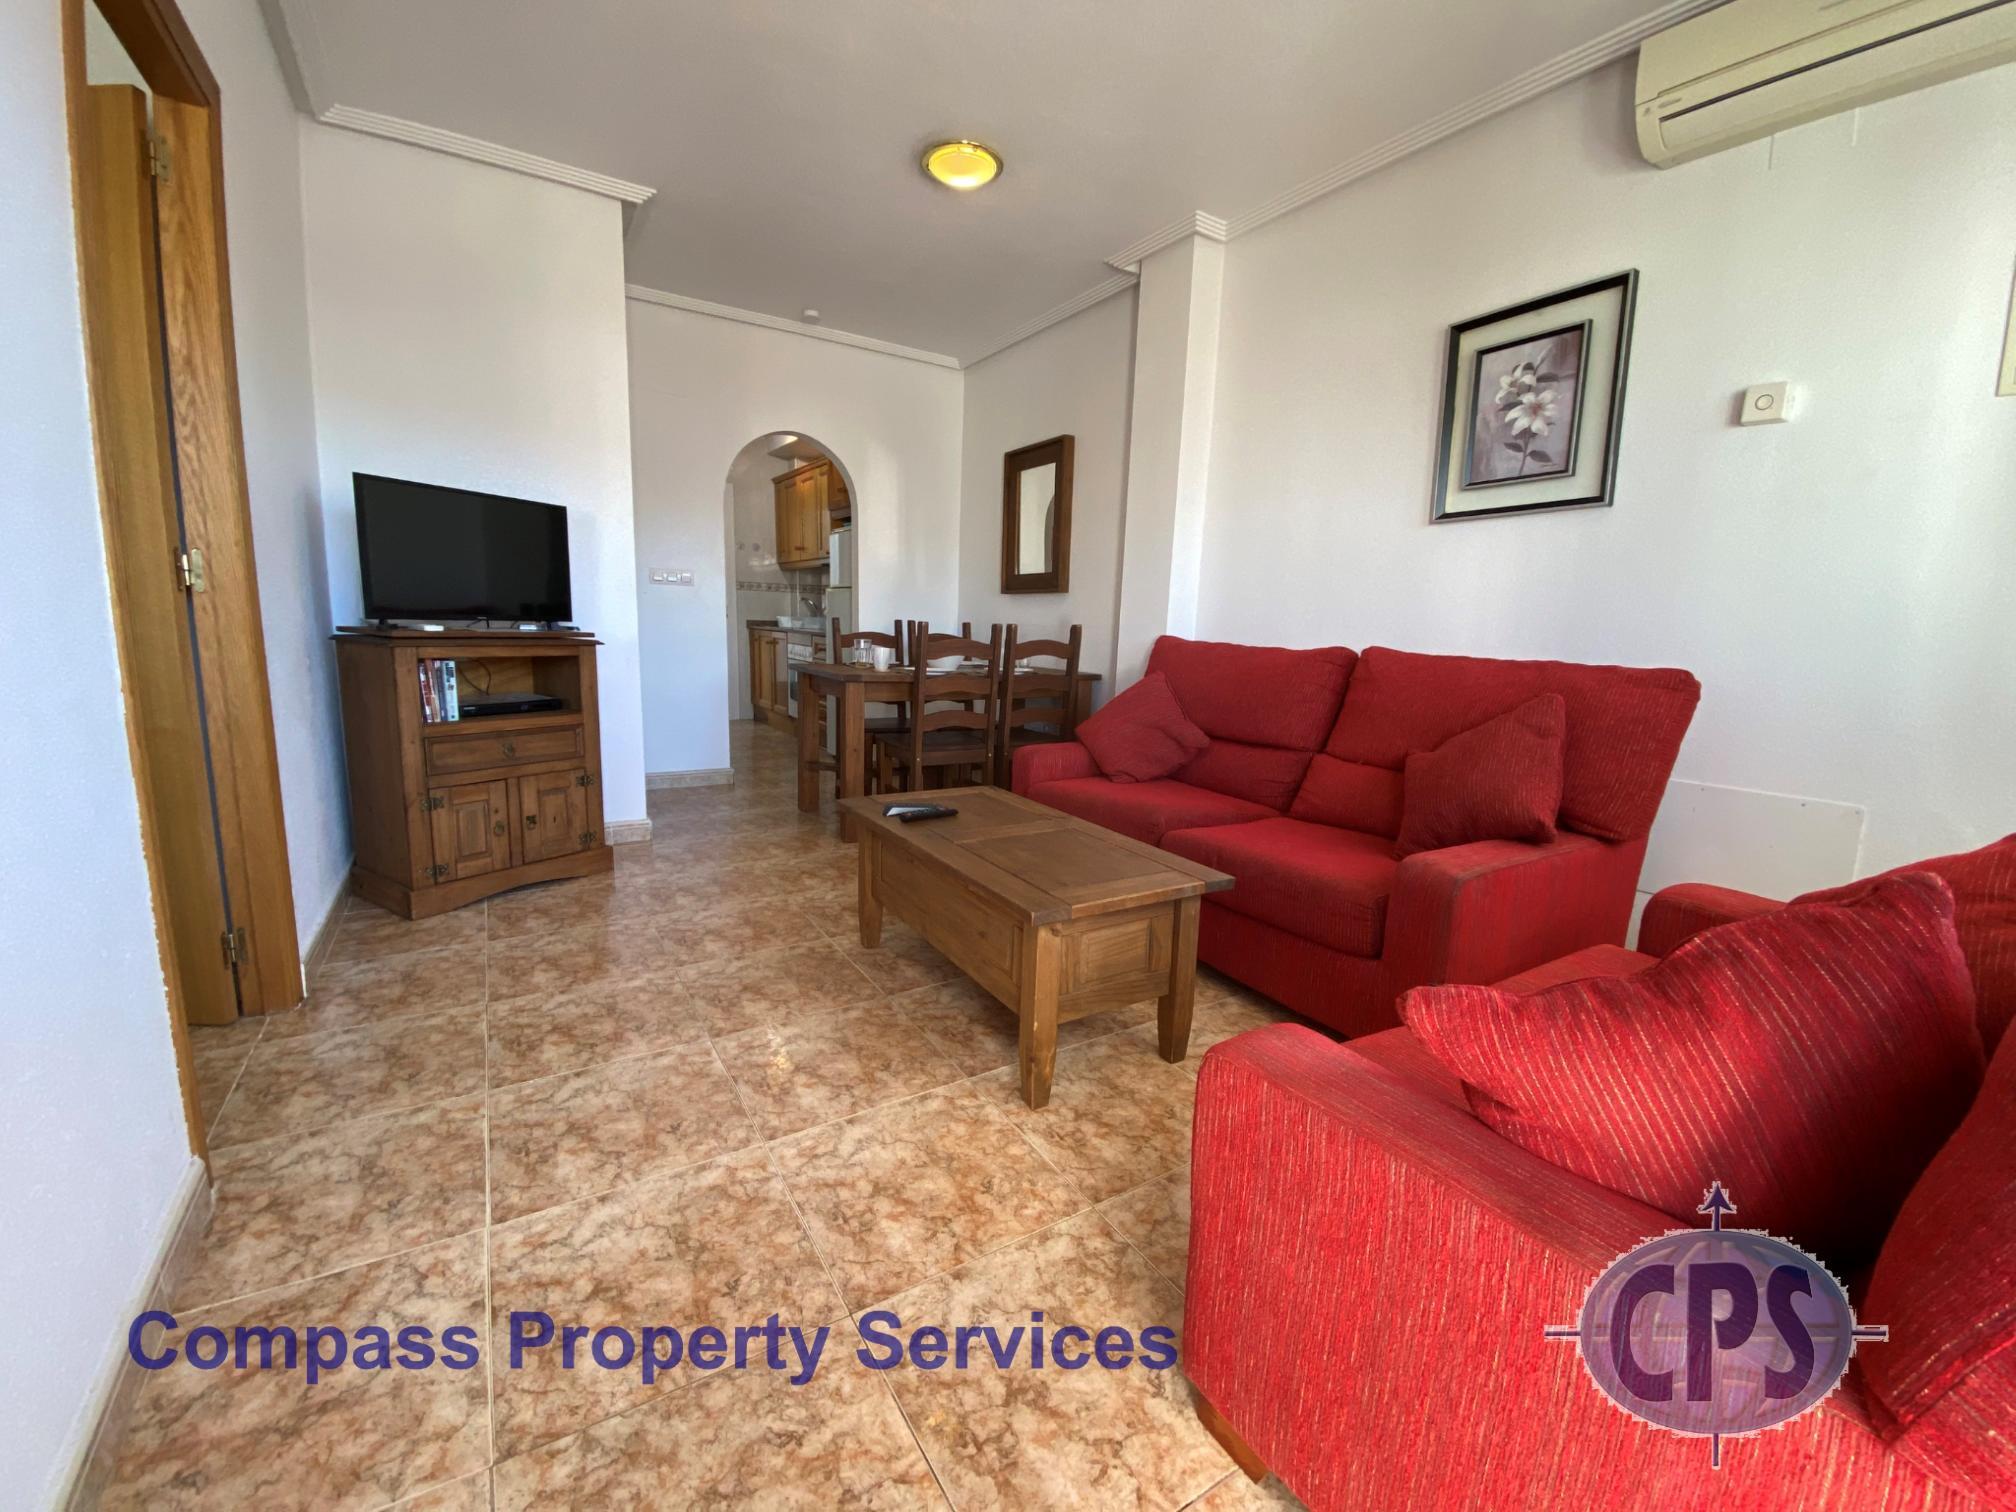 Apartment La Cinuelica R3 1st flr apt overlooking pool l149 photo 28556782